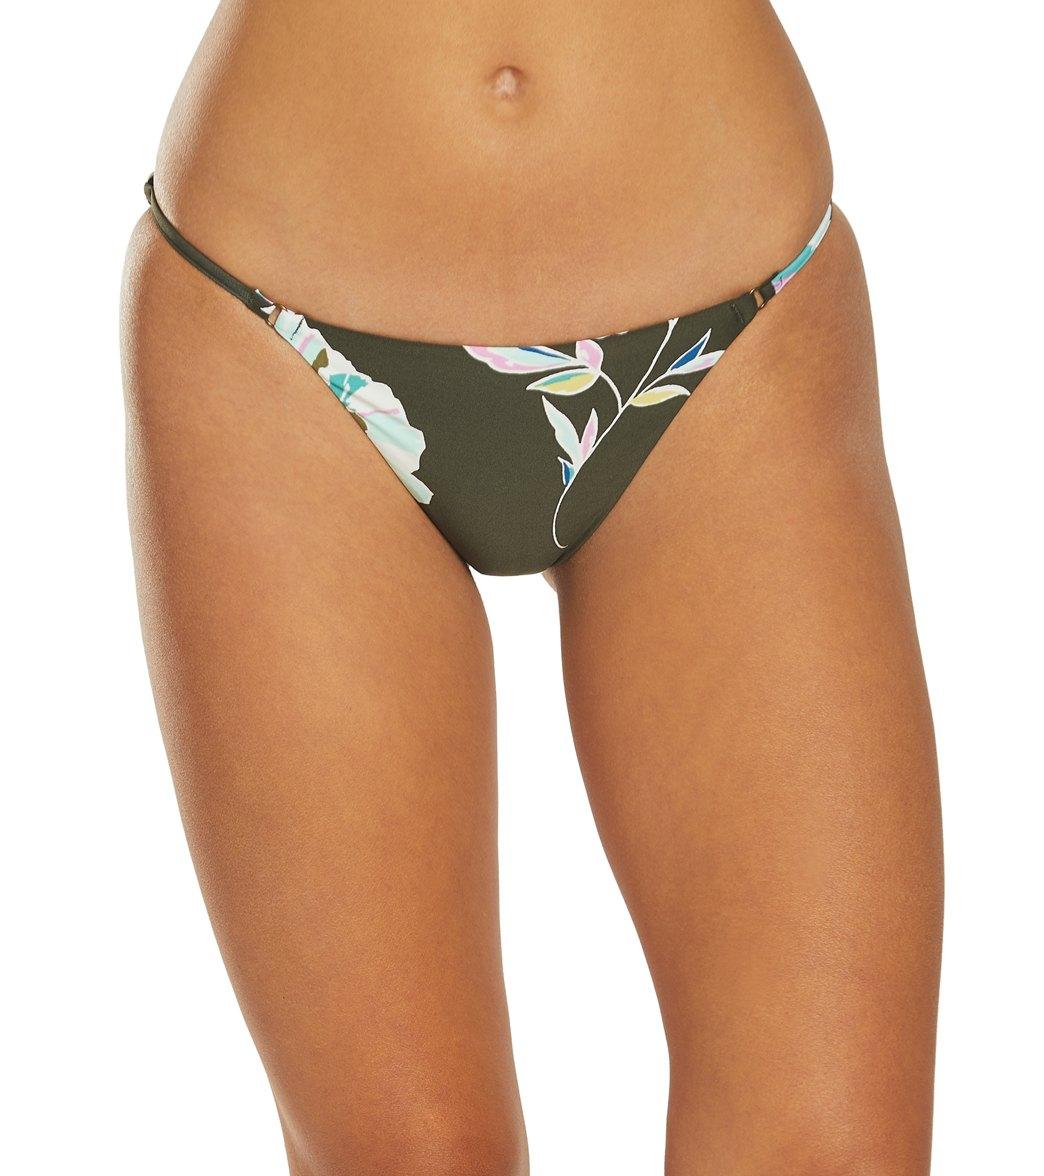 ONEILL Womens Farah Cheeky Bikini Bottom